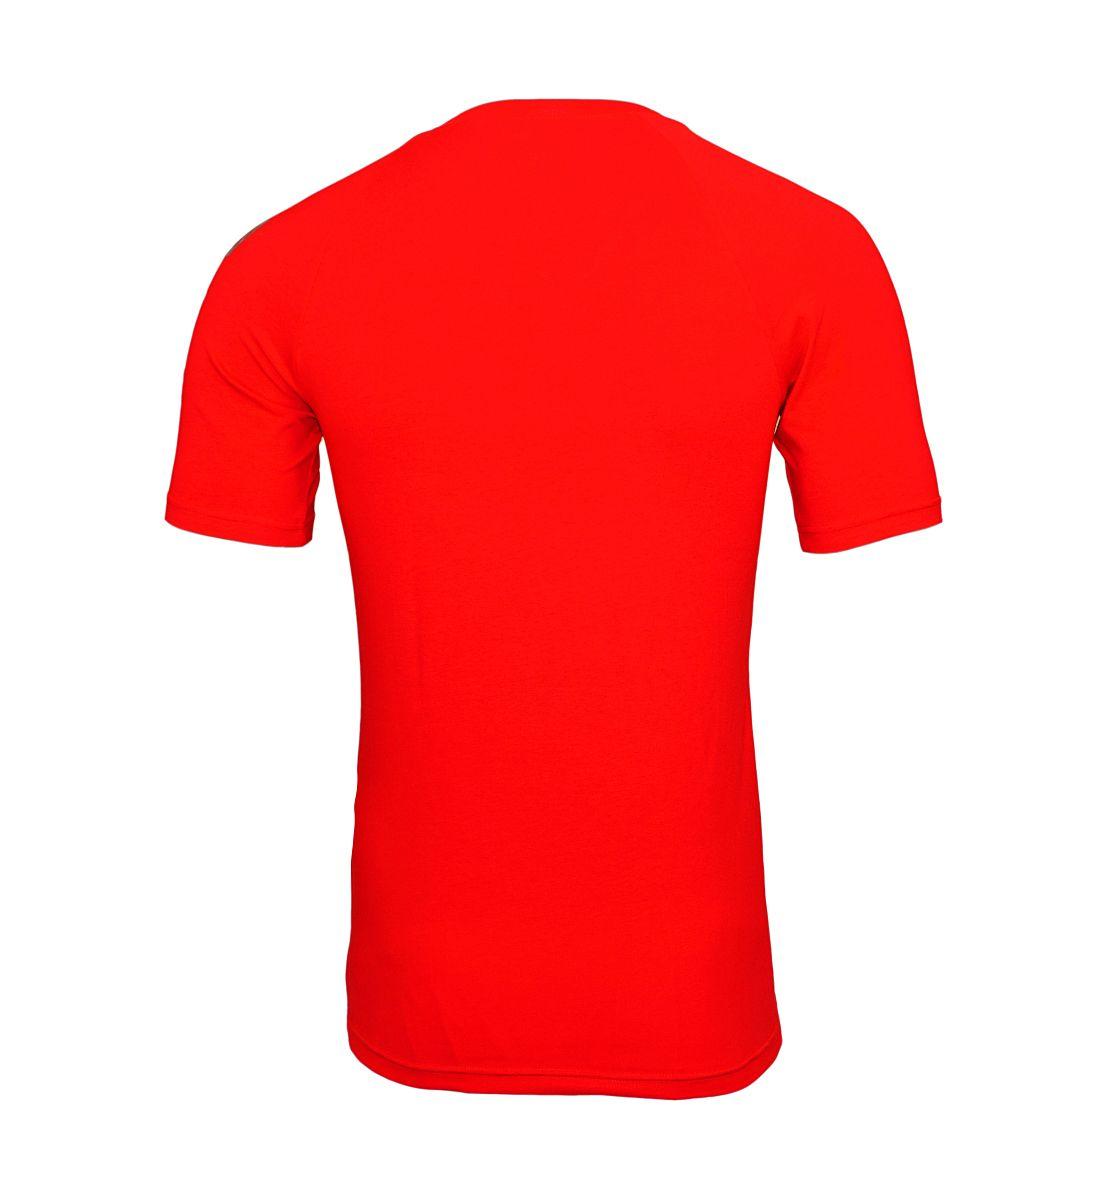 Emporio Armani T-Shirt V-Ausschnitt 111760 8P725 17574 TANGO RED W18-EATS1